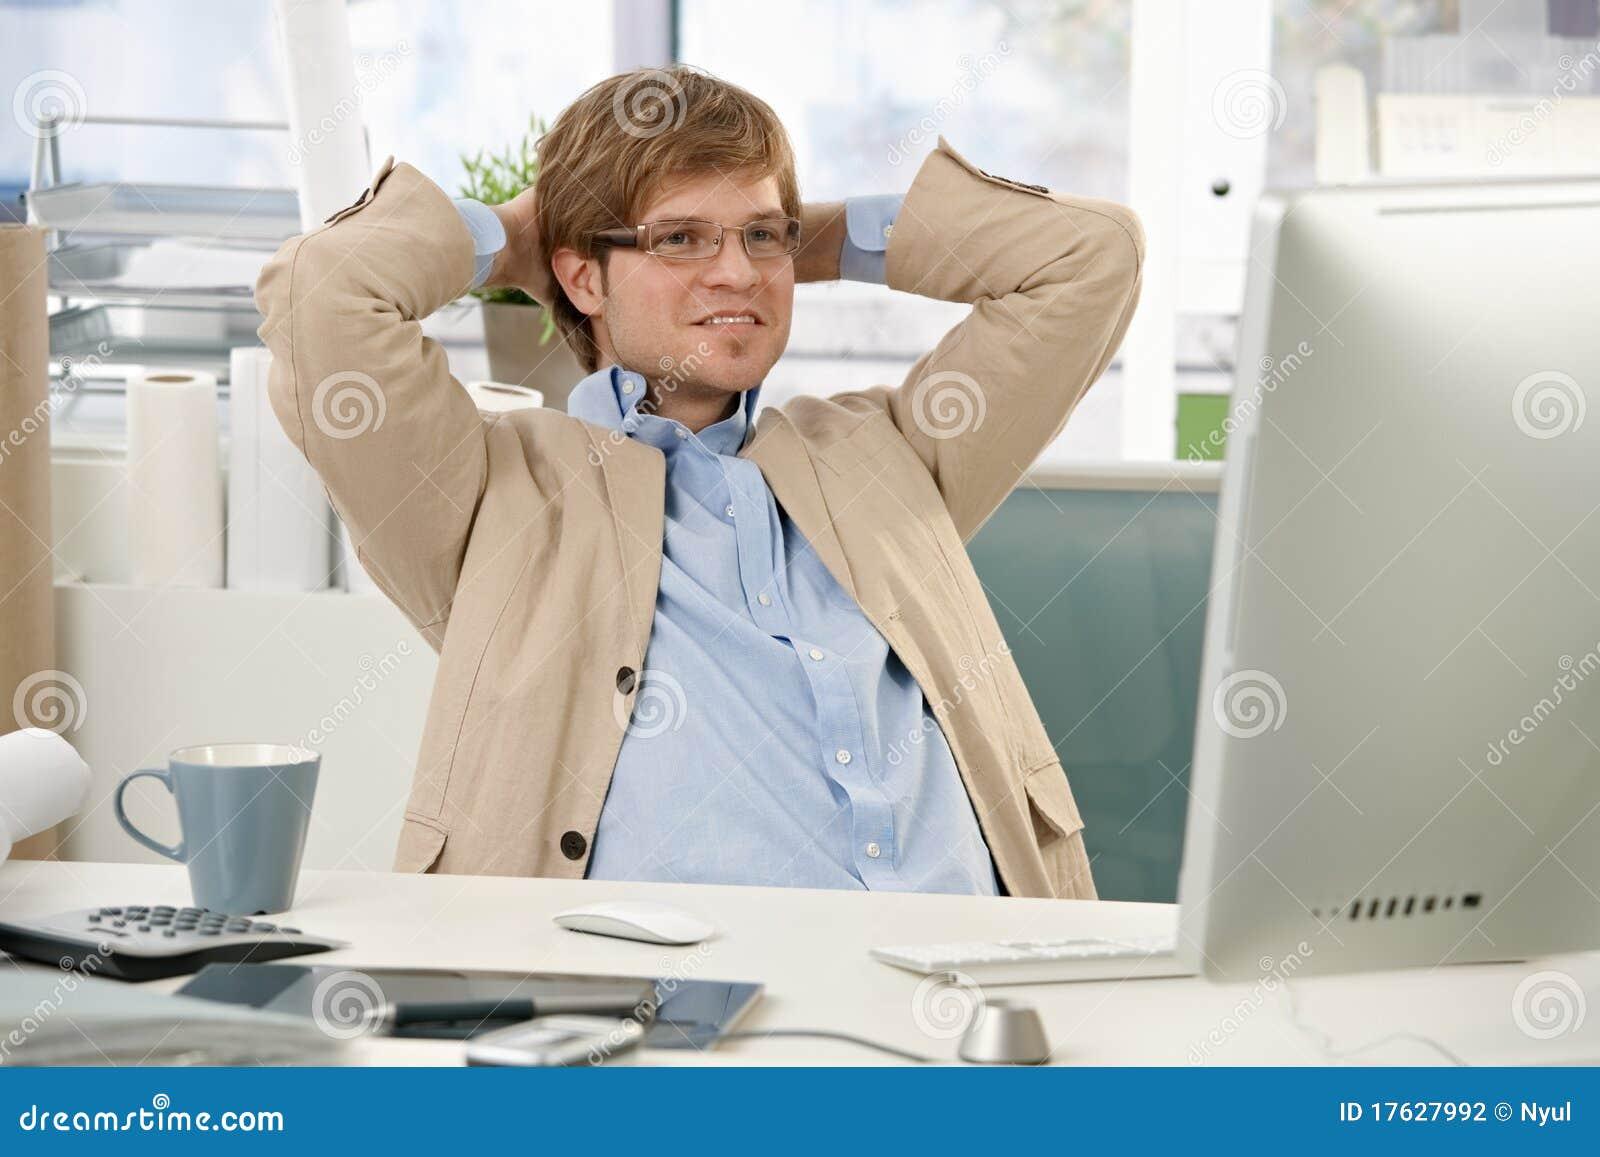 Confident businessman at desk desk